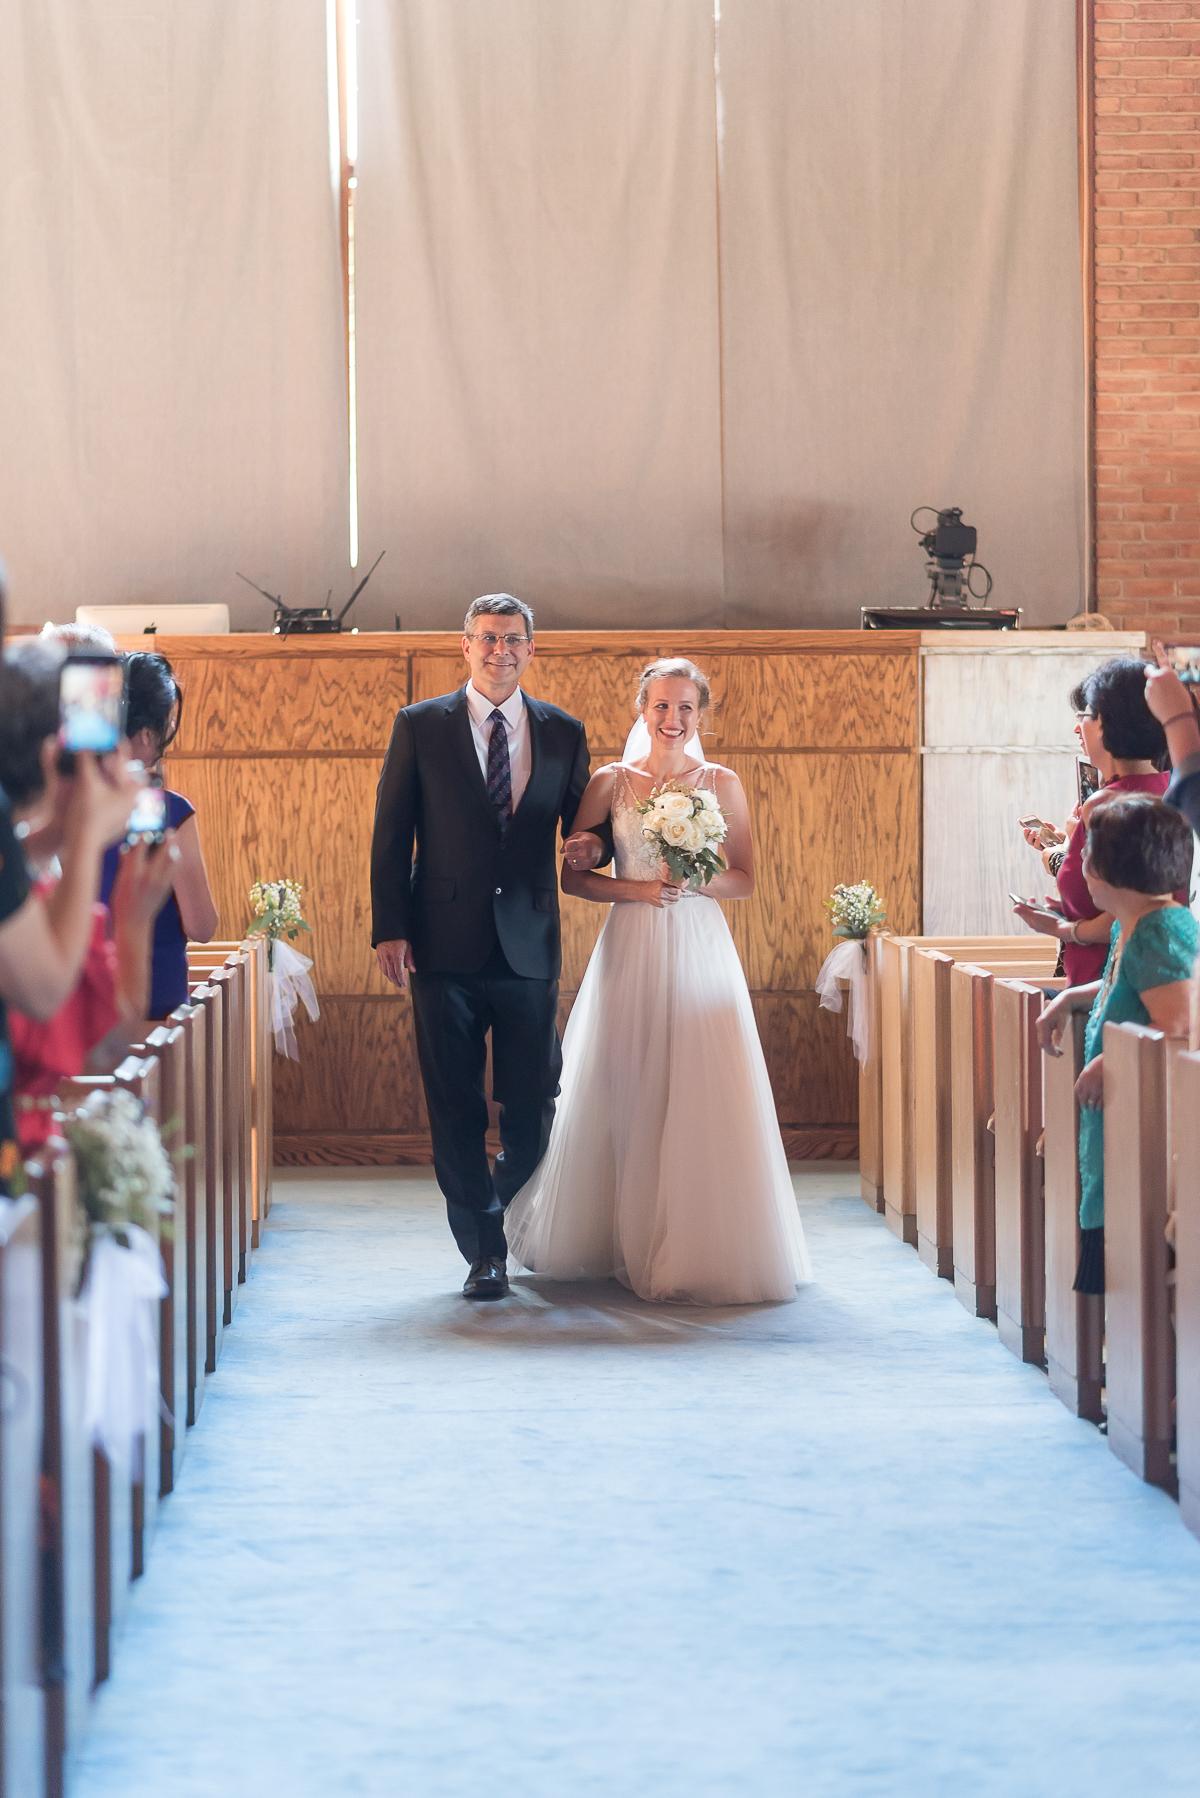 Elkridge-Furnace-Inn-Wedding-Reception-Bride-Groom-30